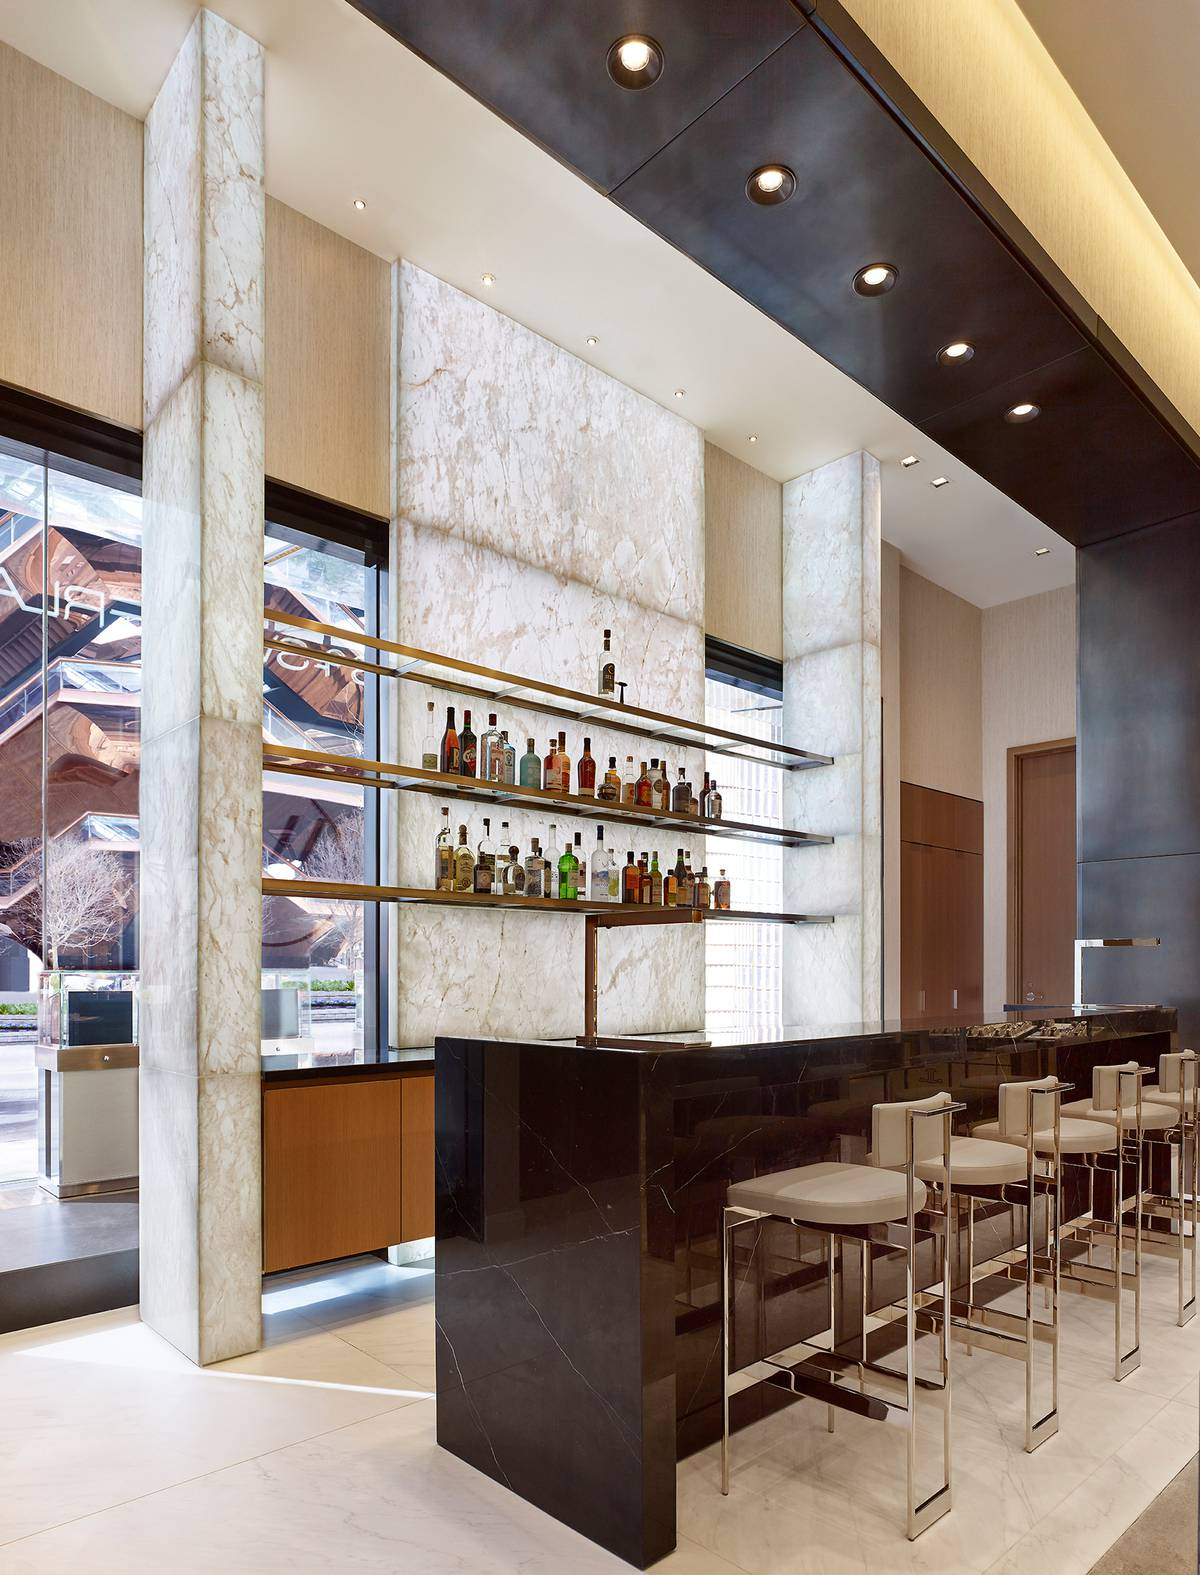 Watches of Switzerland - WOS Hudson Yards Backbar Onyx, NY, NYC - Architect: Neumann & Rudy